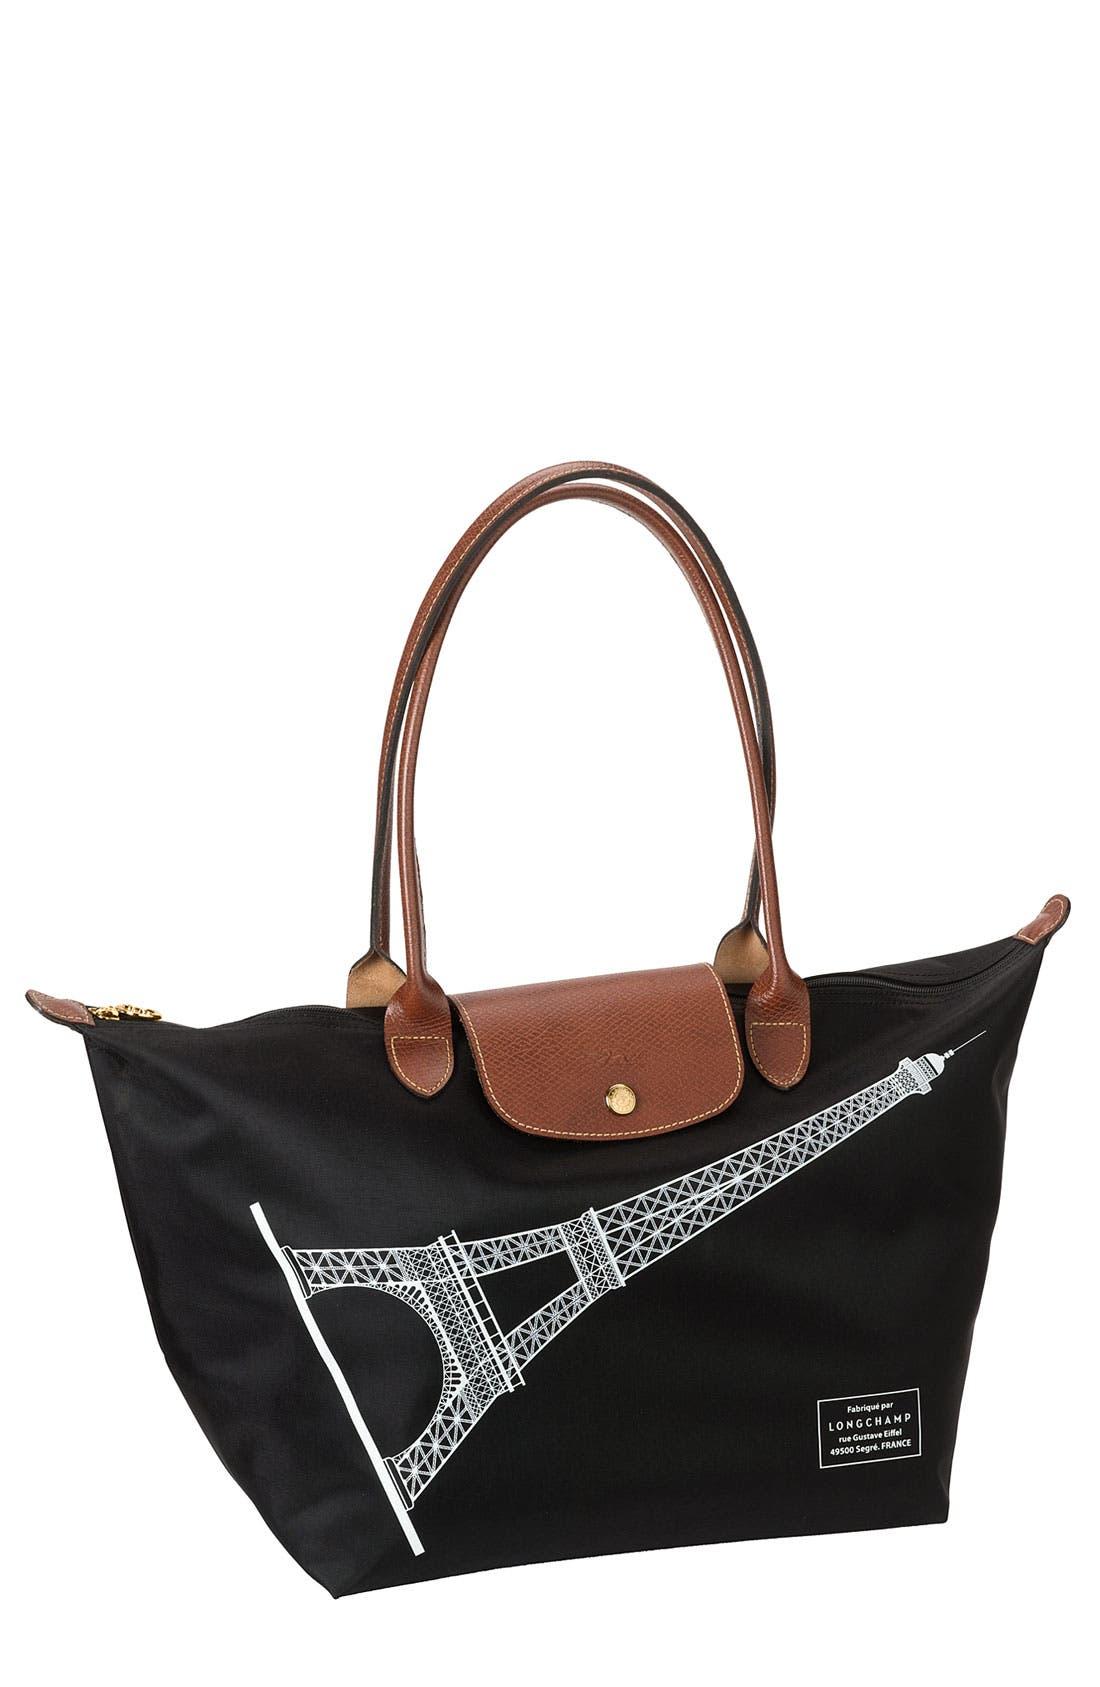 Main Image - Longchamp 'Pliage Tour - Eiffel' Tote